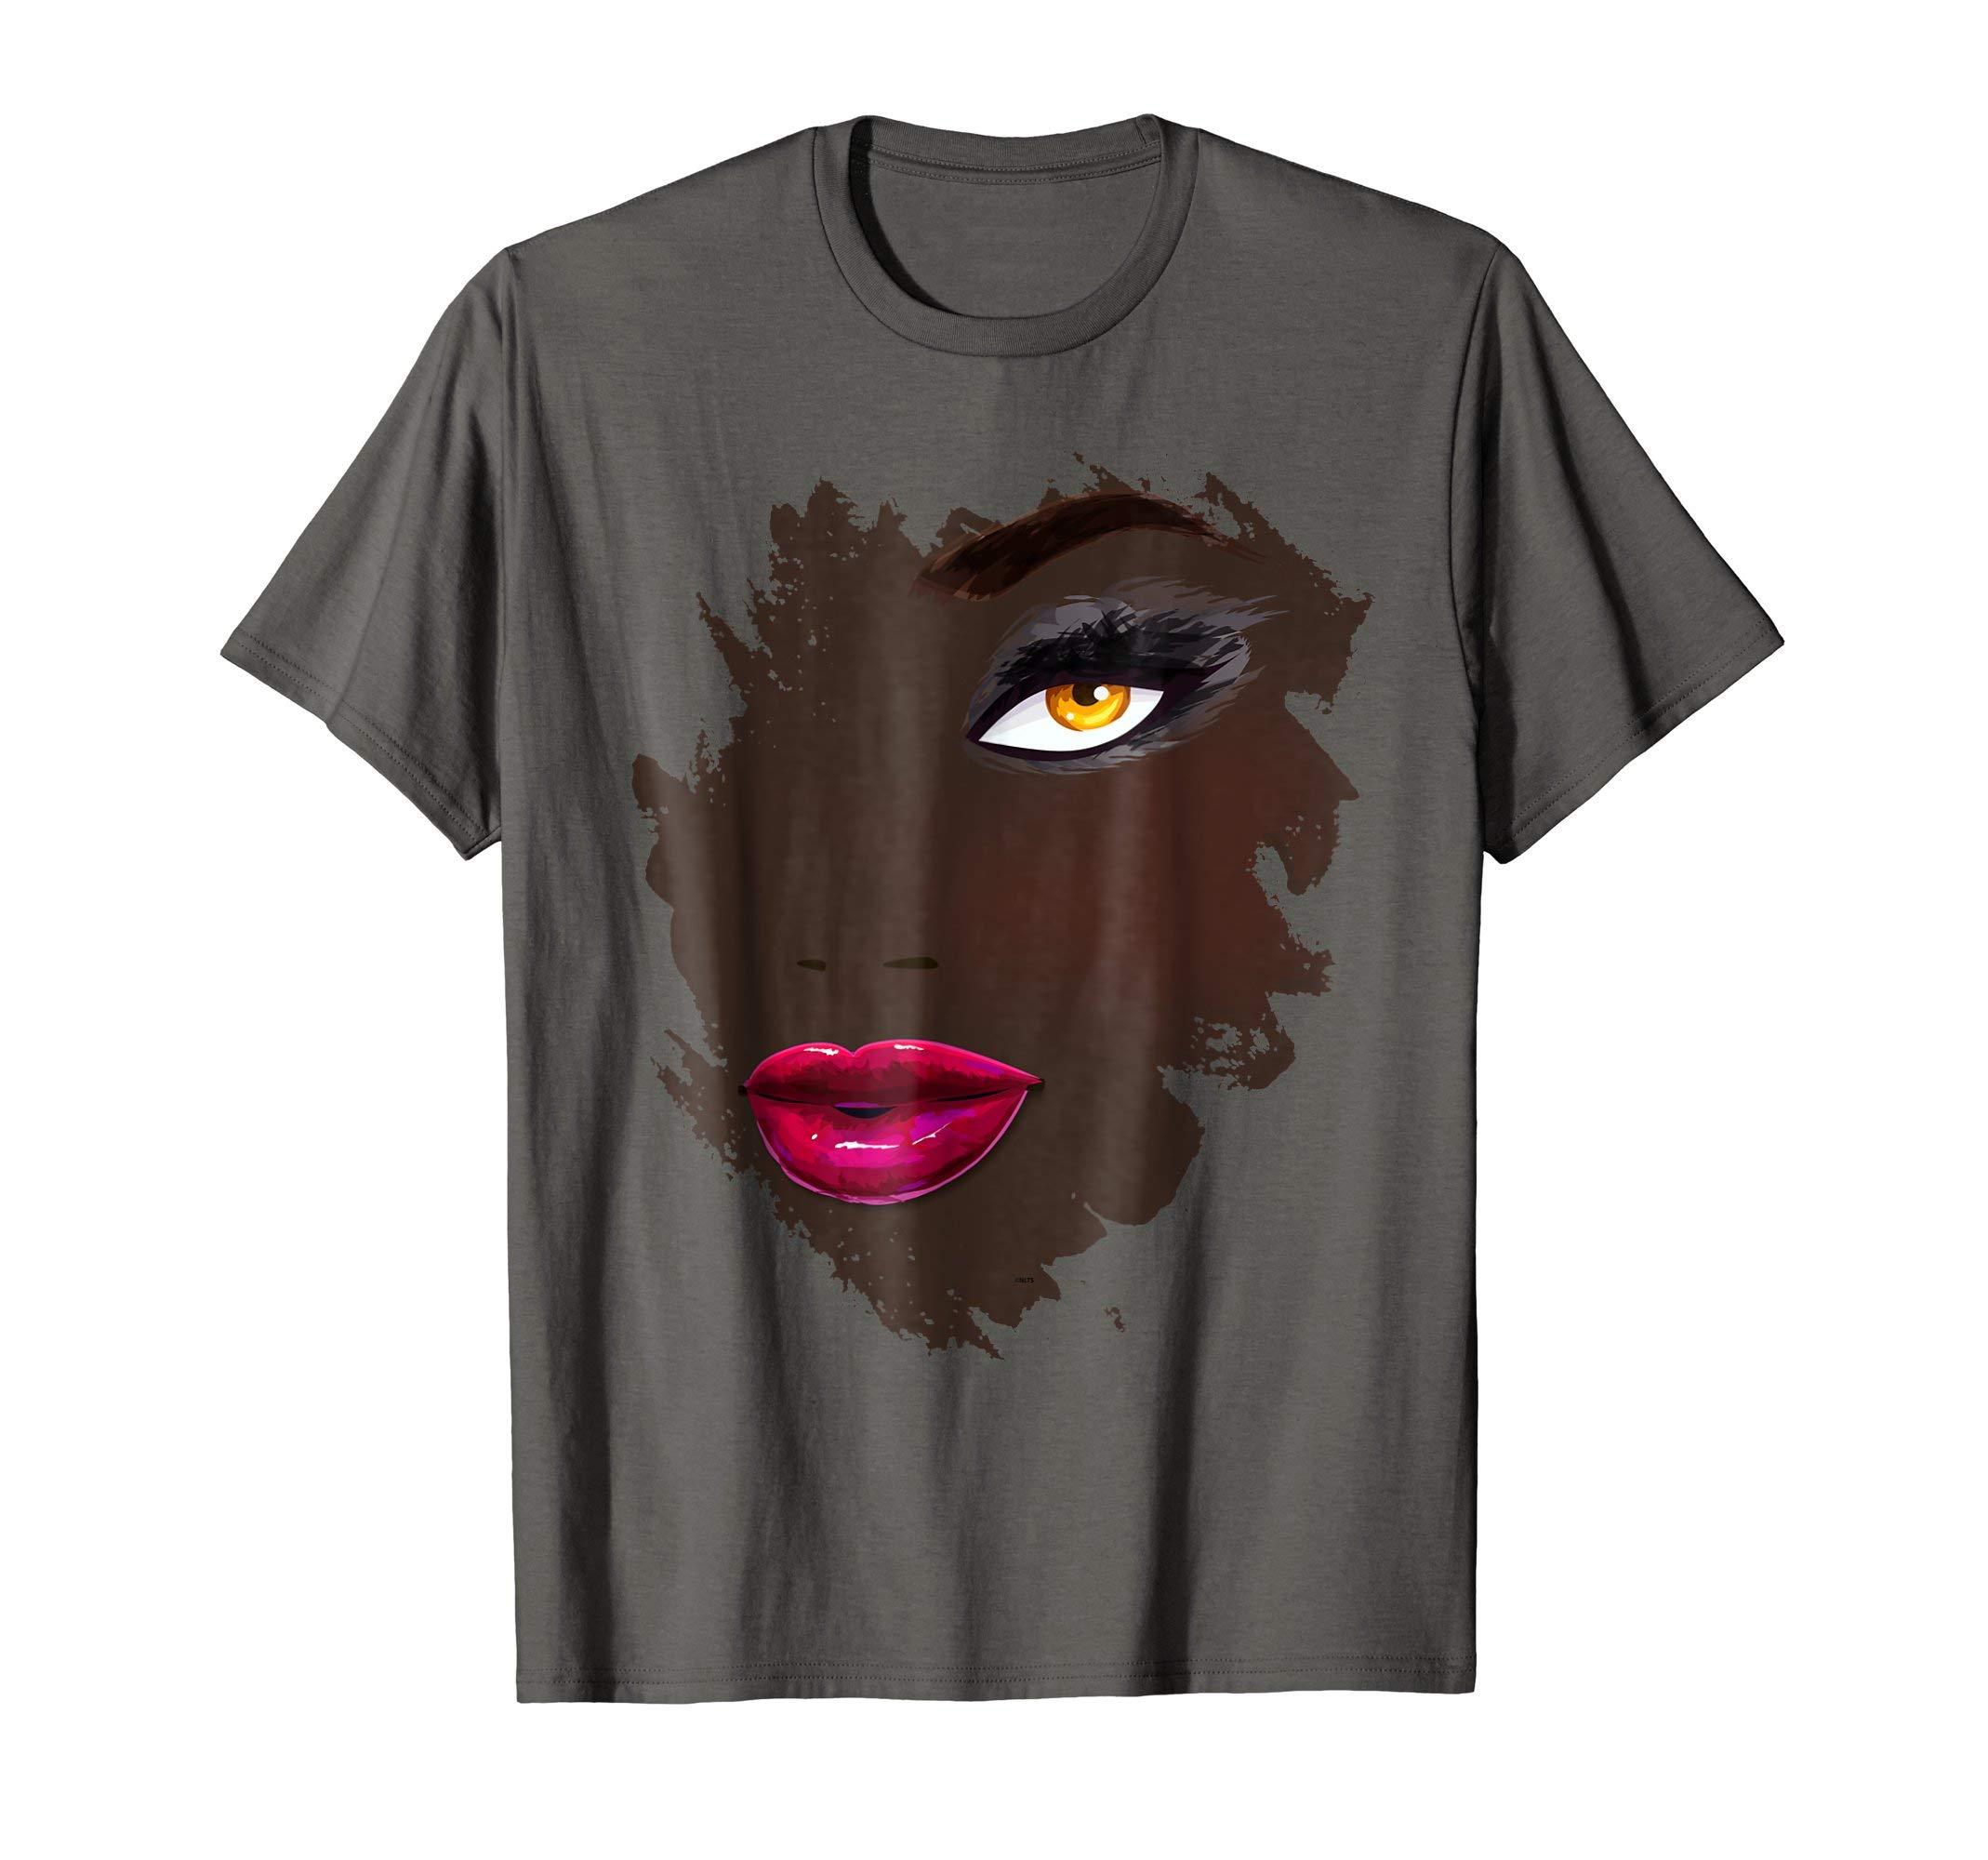 African-American-Eyelashes-Makeup-In-Vogue-t-shirt